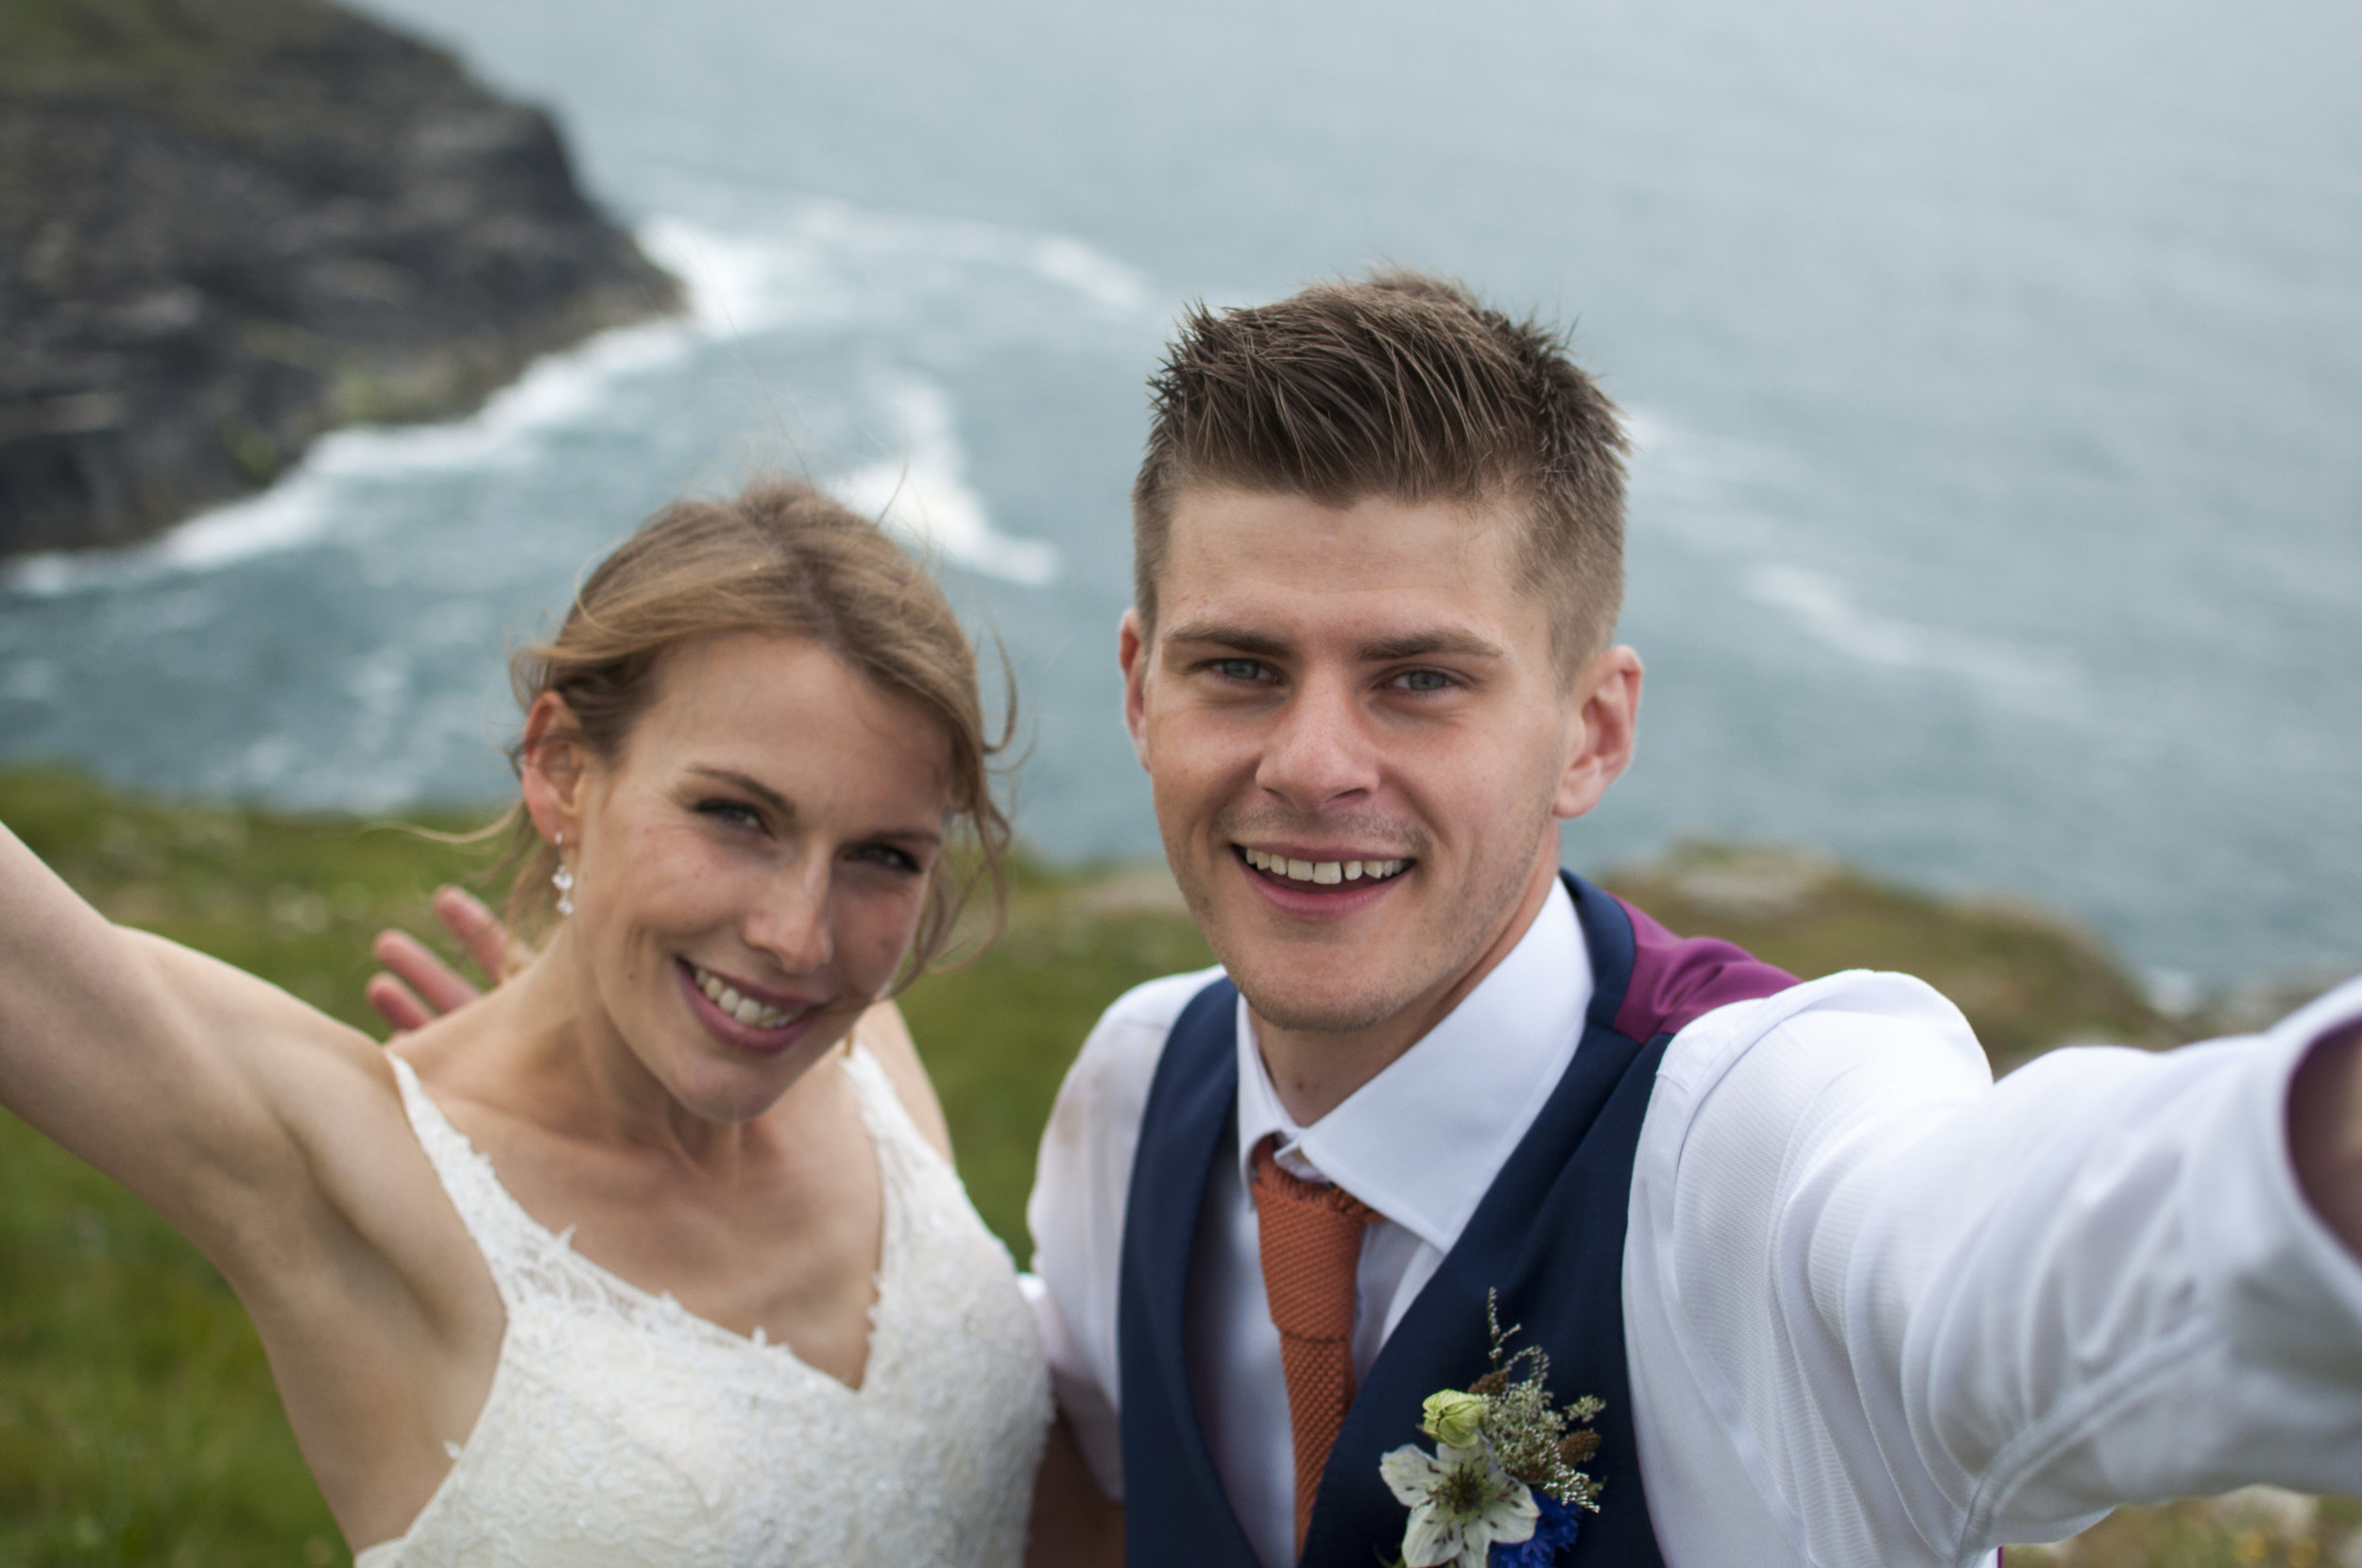 nottingham wedding photographer (1 of 1).jpg